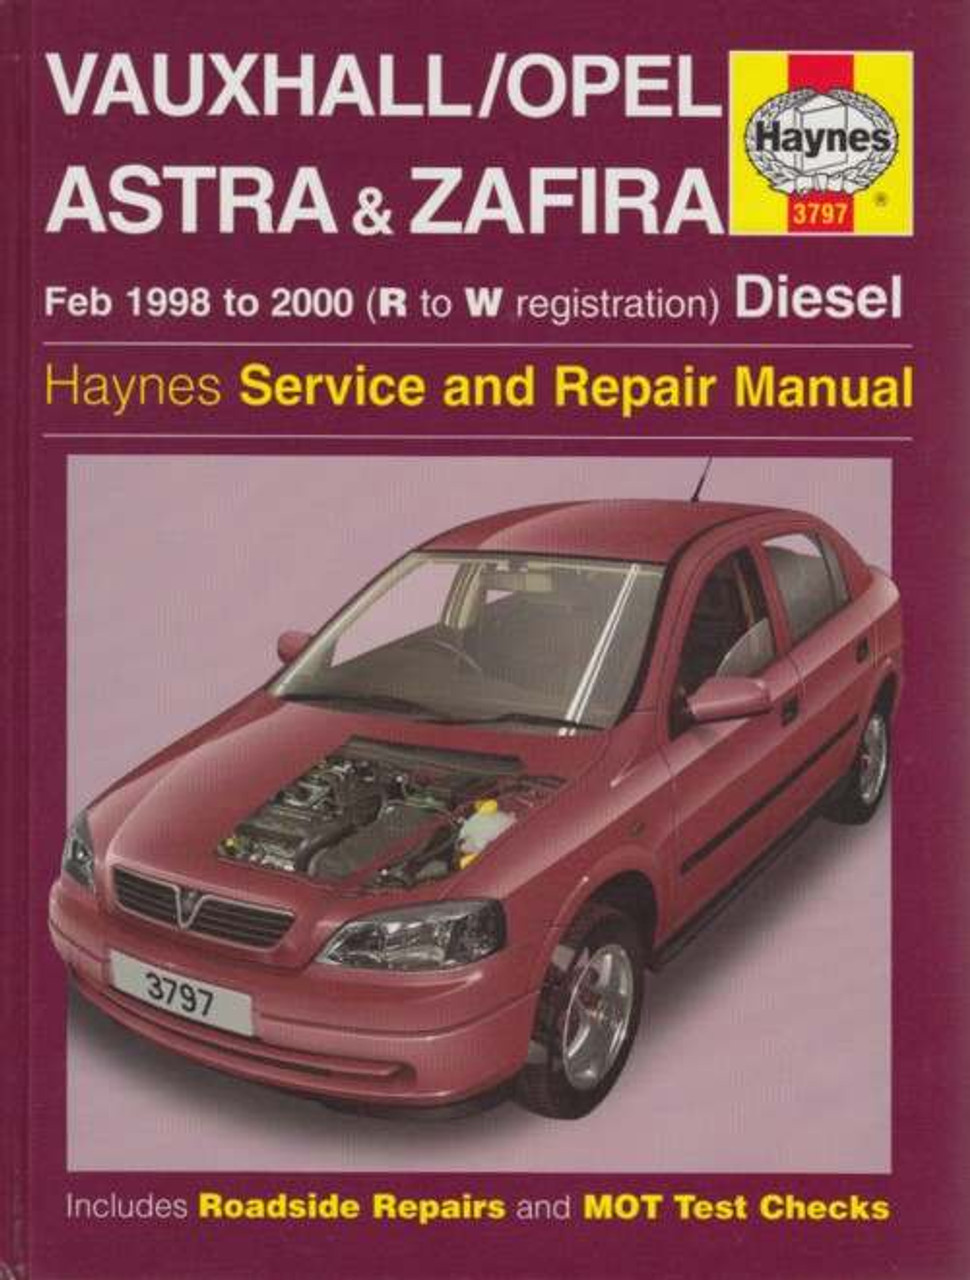 buy holden vauxhall opel astra zafira 1998 2000 diesel rh automotobookshop com au opel zafira a service manual pdf opel zafira a workshop manual